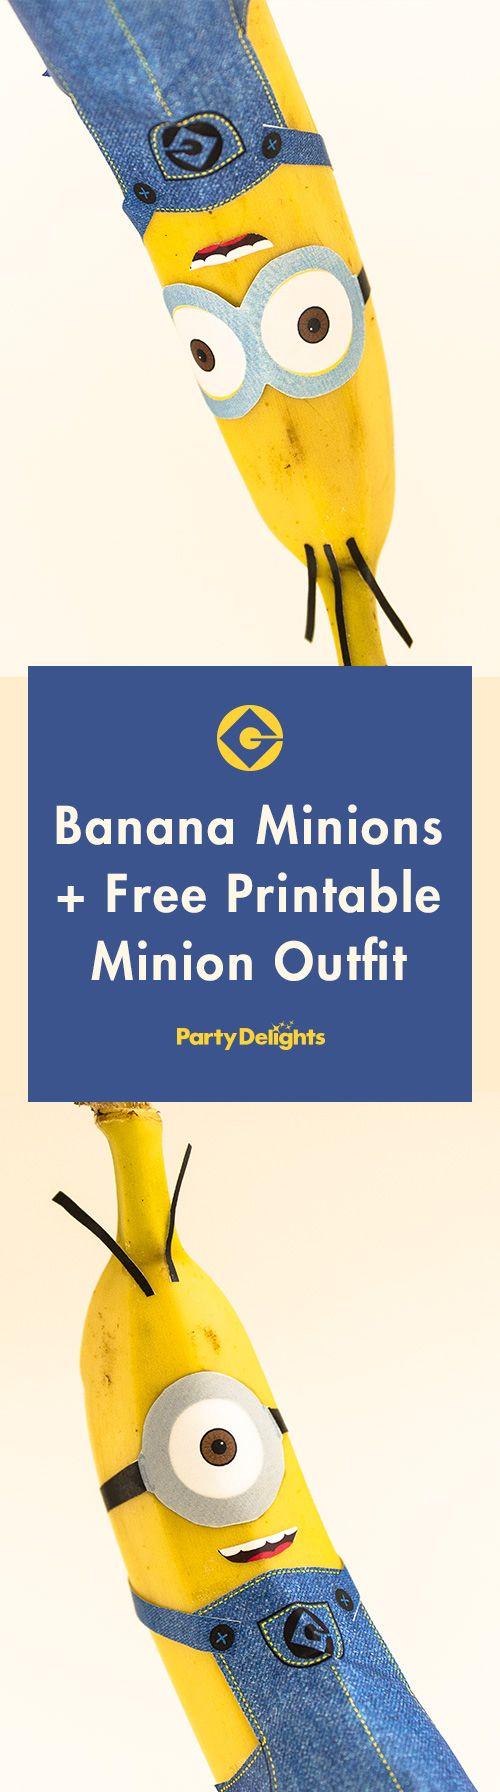 Minion Birthday Party Minion Birthday Girly Minion Party Girly And Birthdays